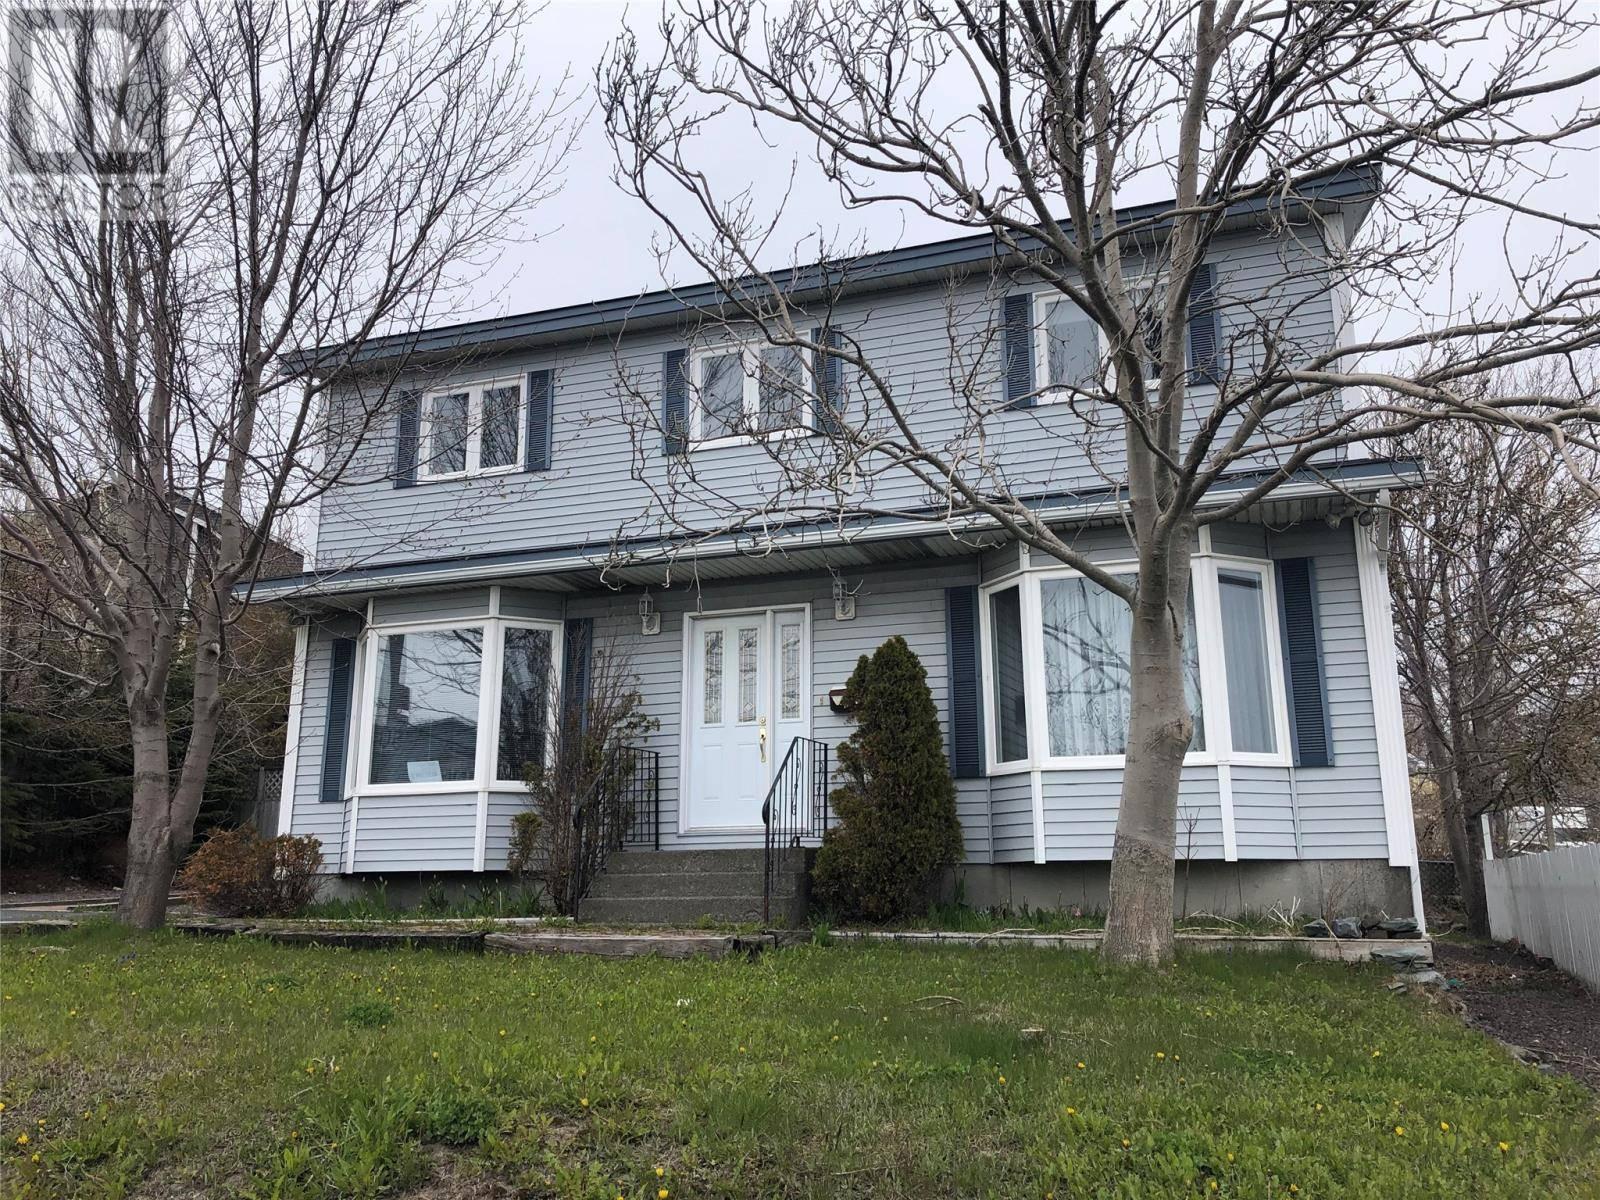 House for sale at 532 Newfoundland Dr St. John's Newfoundland - MLS: 1207578